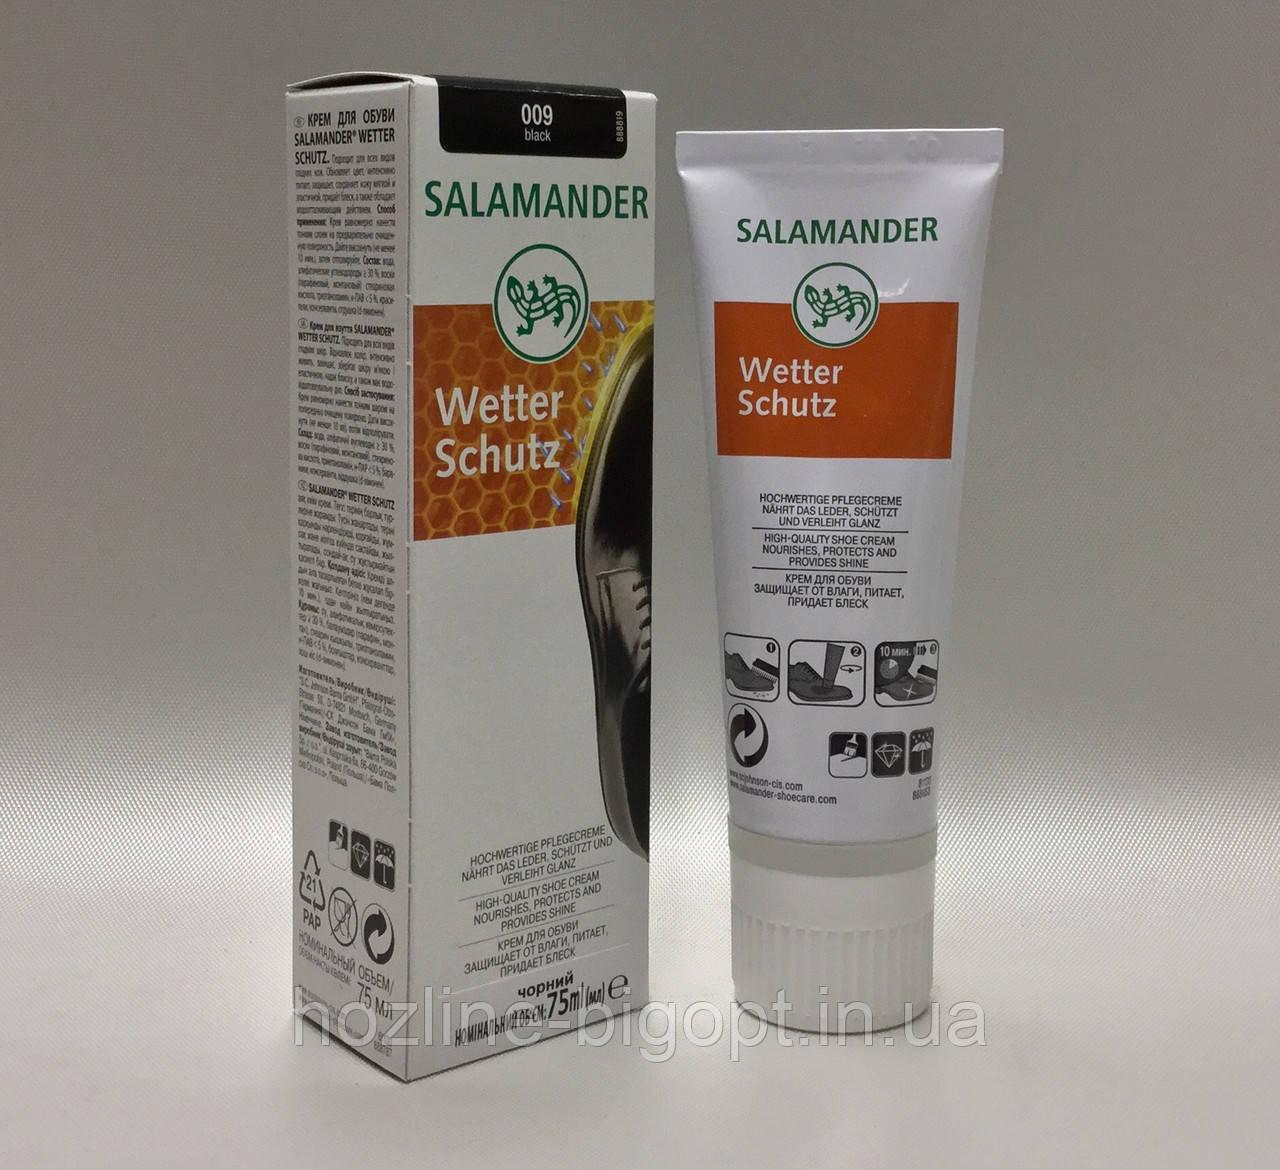 SALAMANDER крем для взуття ЧОРНИЙ 75мл 0113/009 Johnson